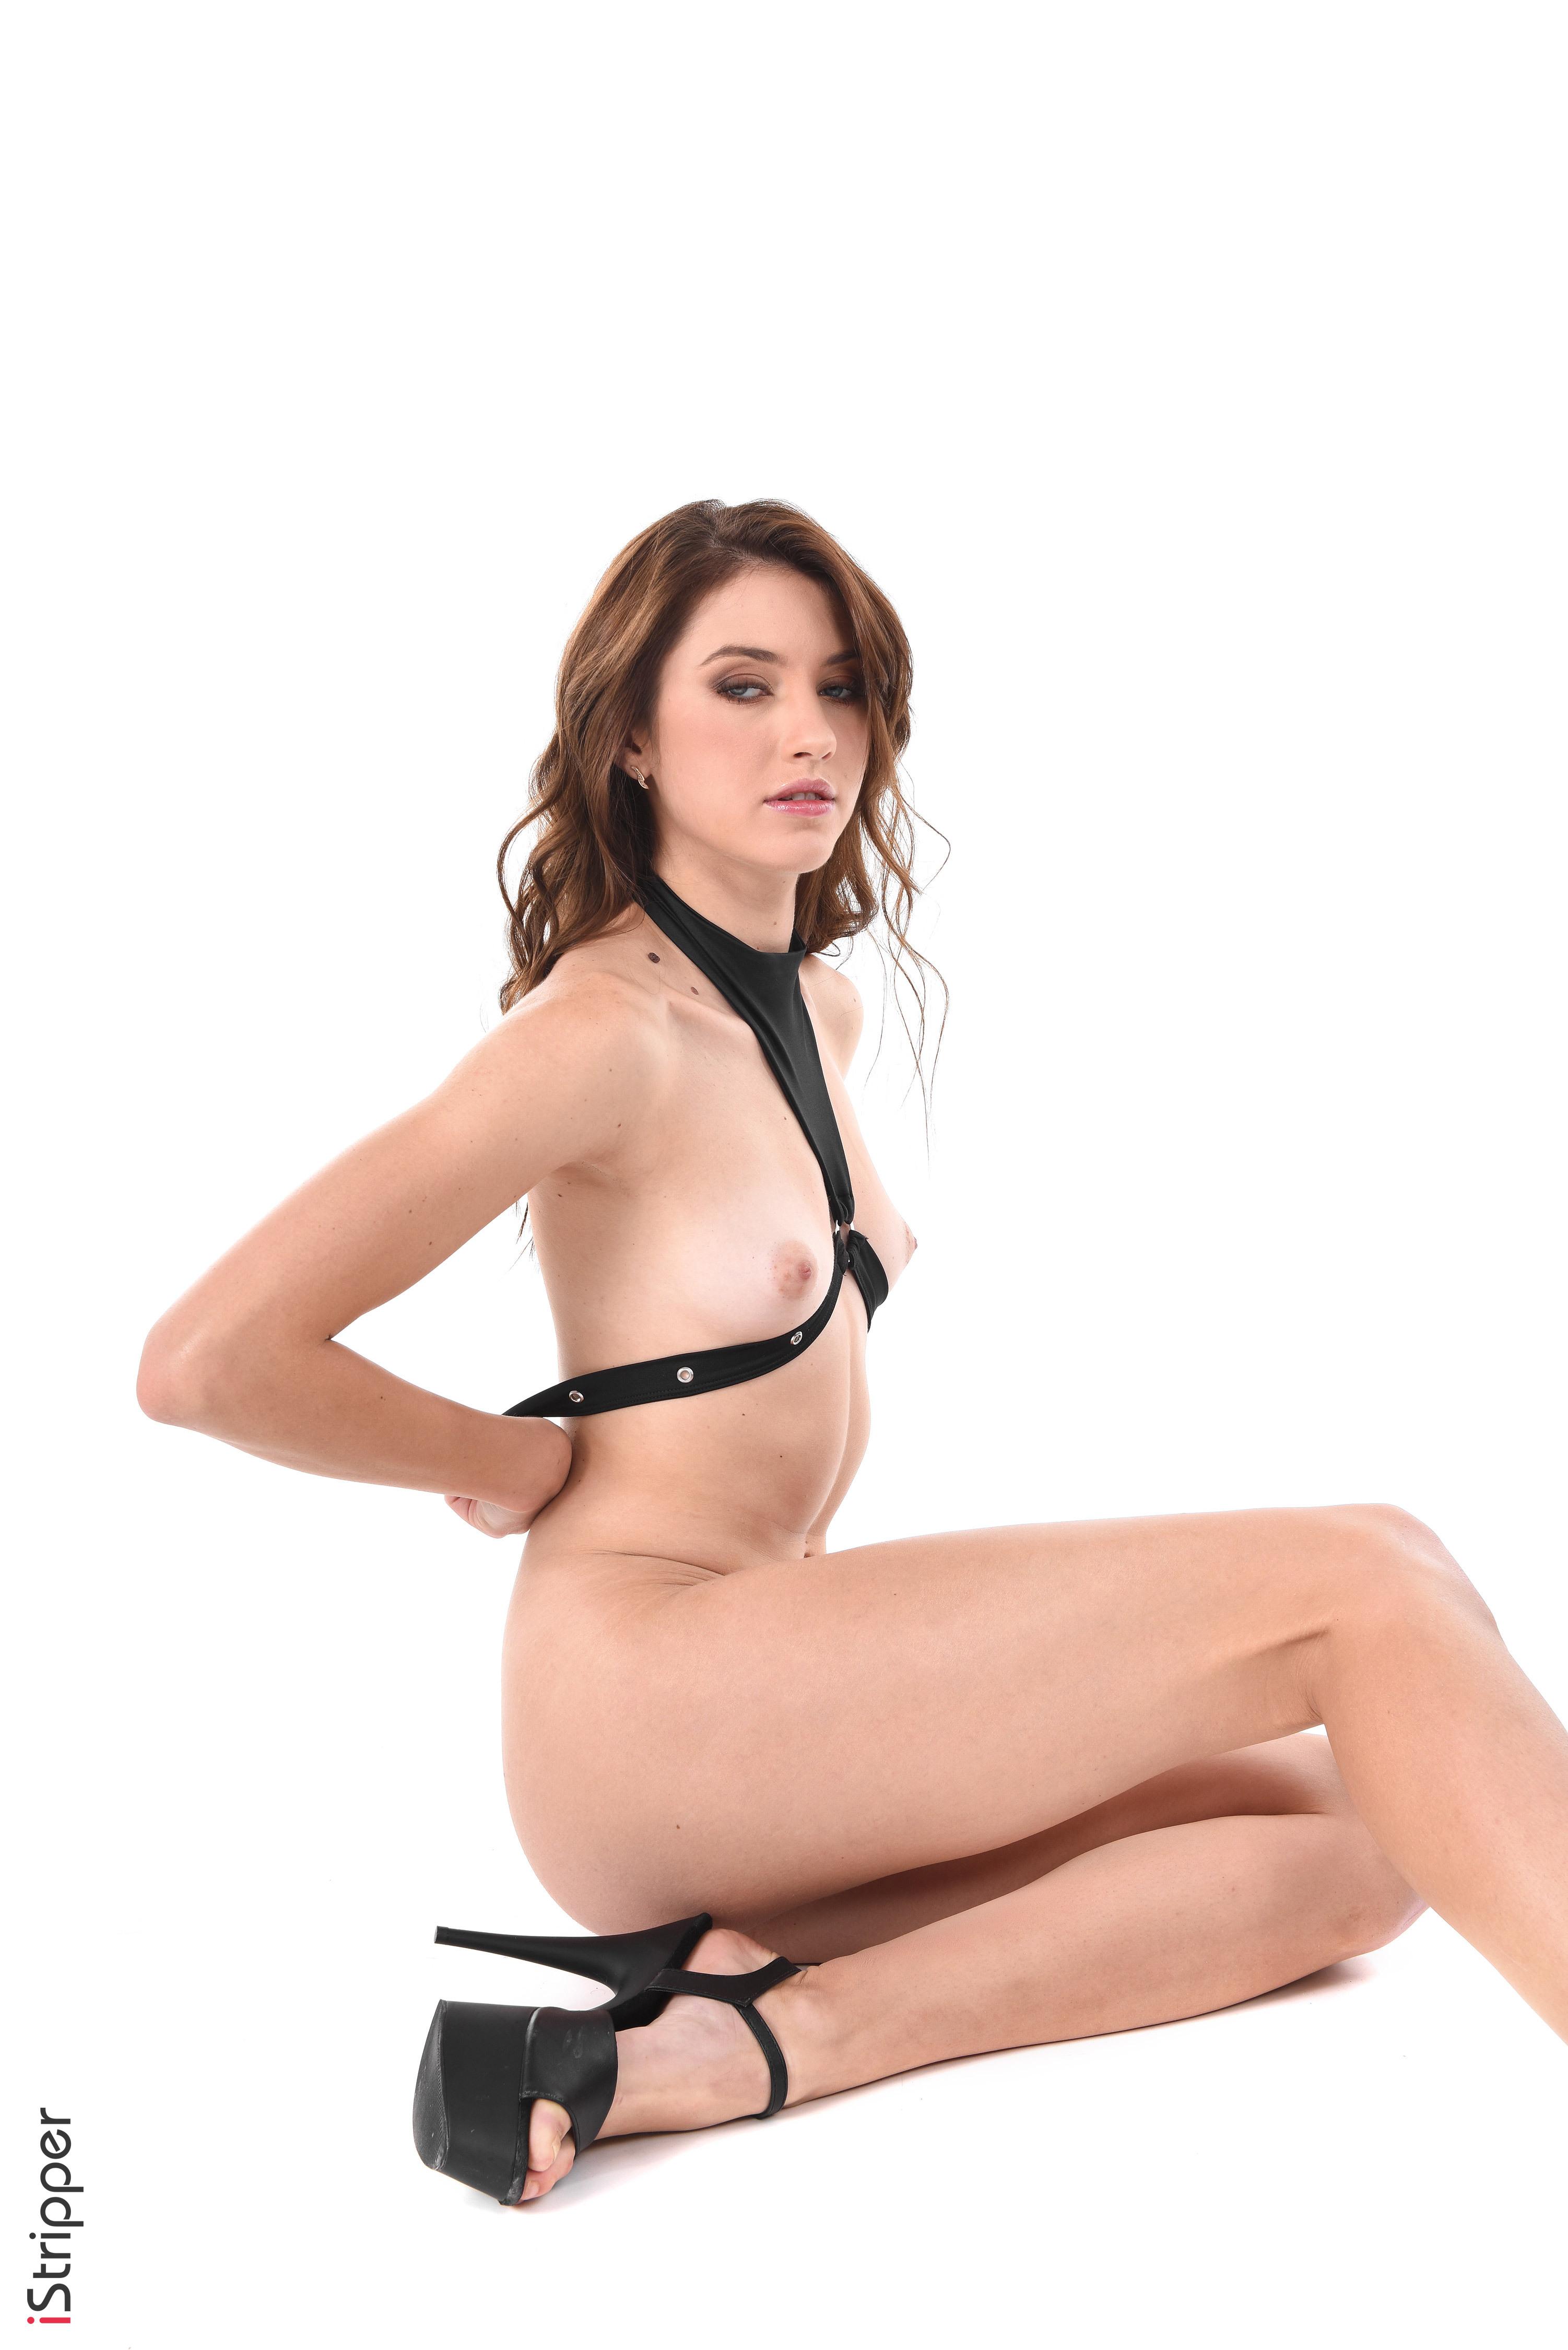 hot Nude Latina females wallpaper